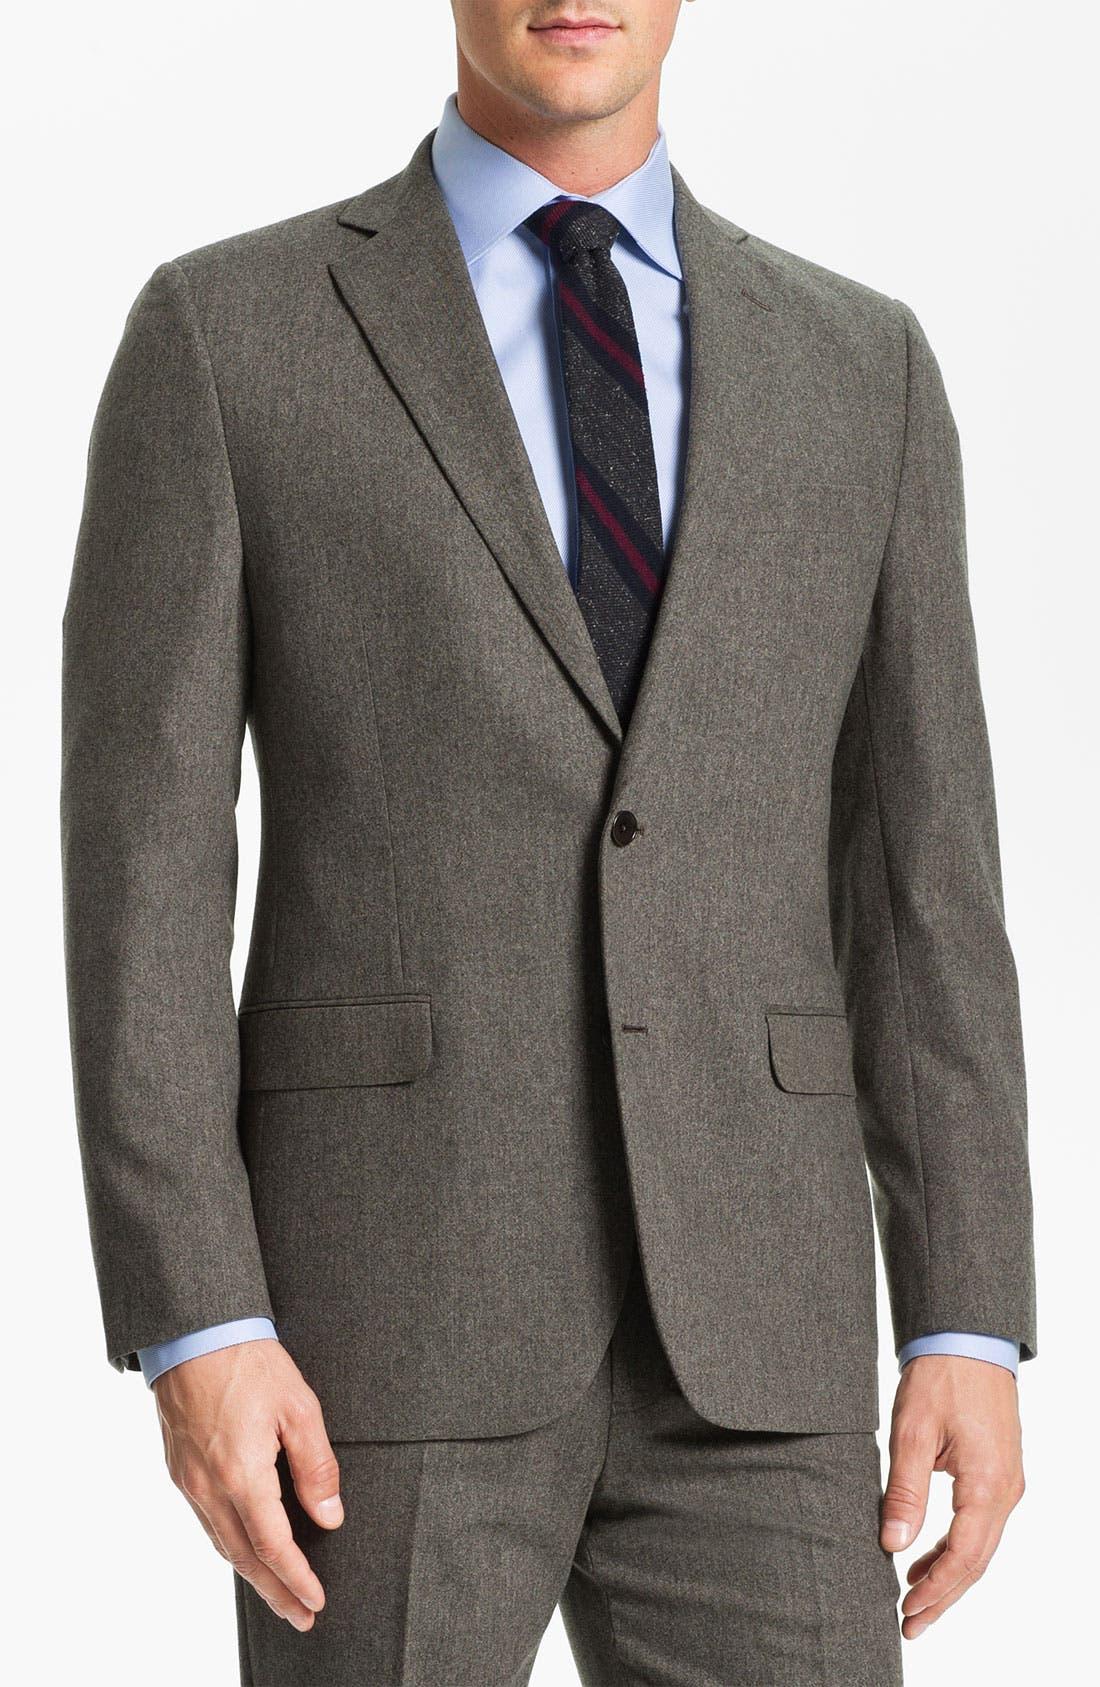 Alternate Image 1 Selected - Brooks Brothers Tweed Wool Suit